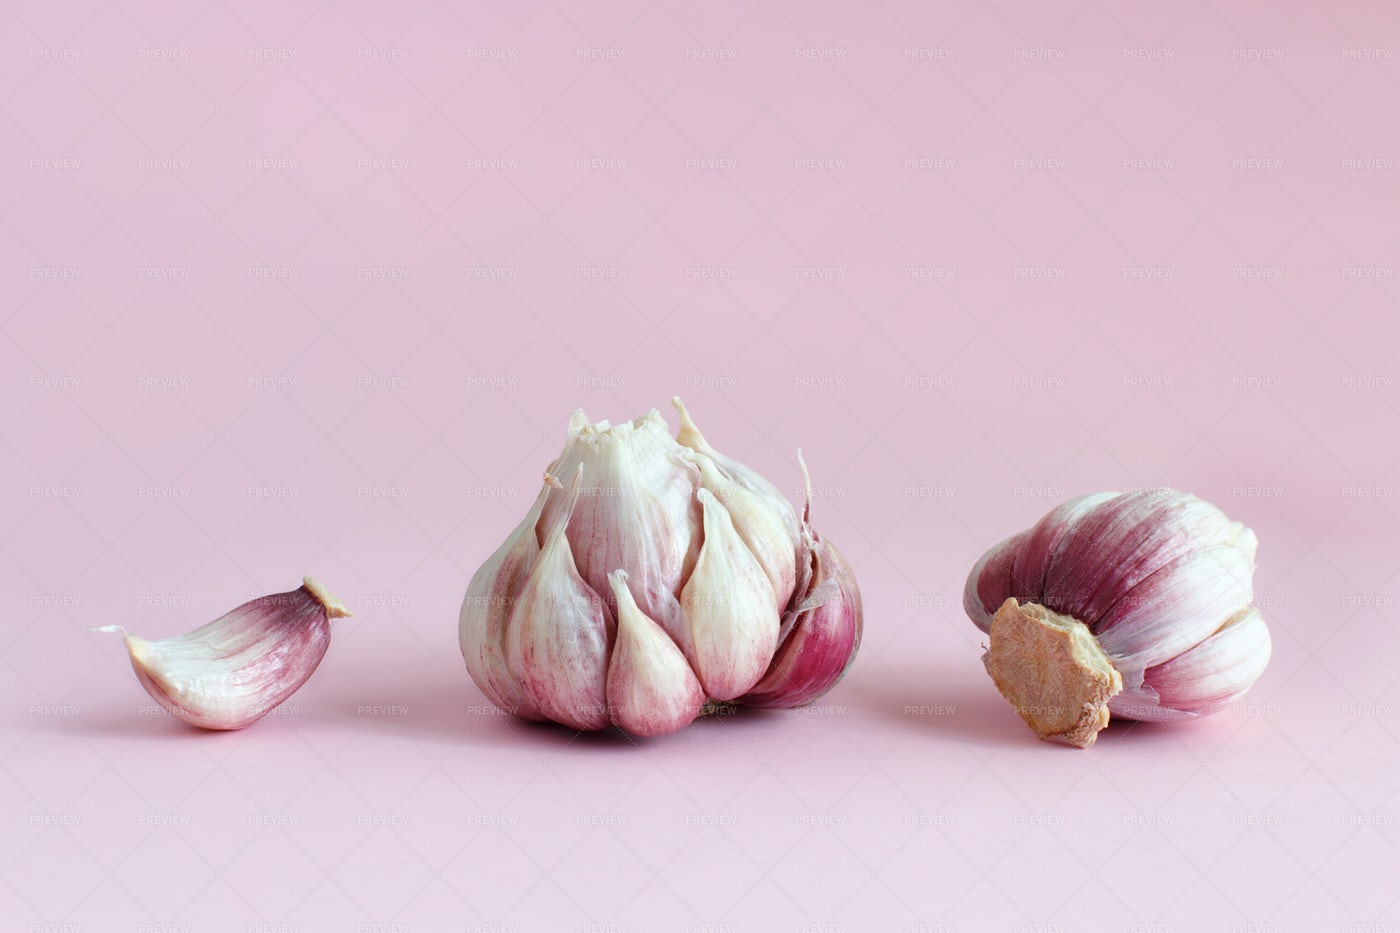 Fresh Garlic Against Pink: Stock Photos